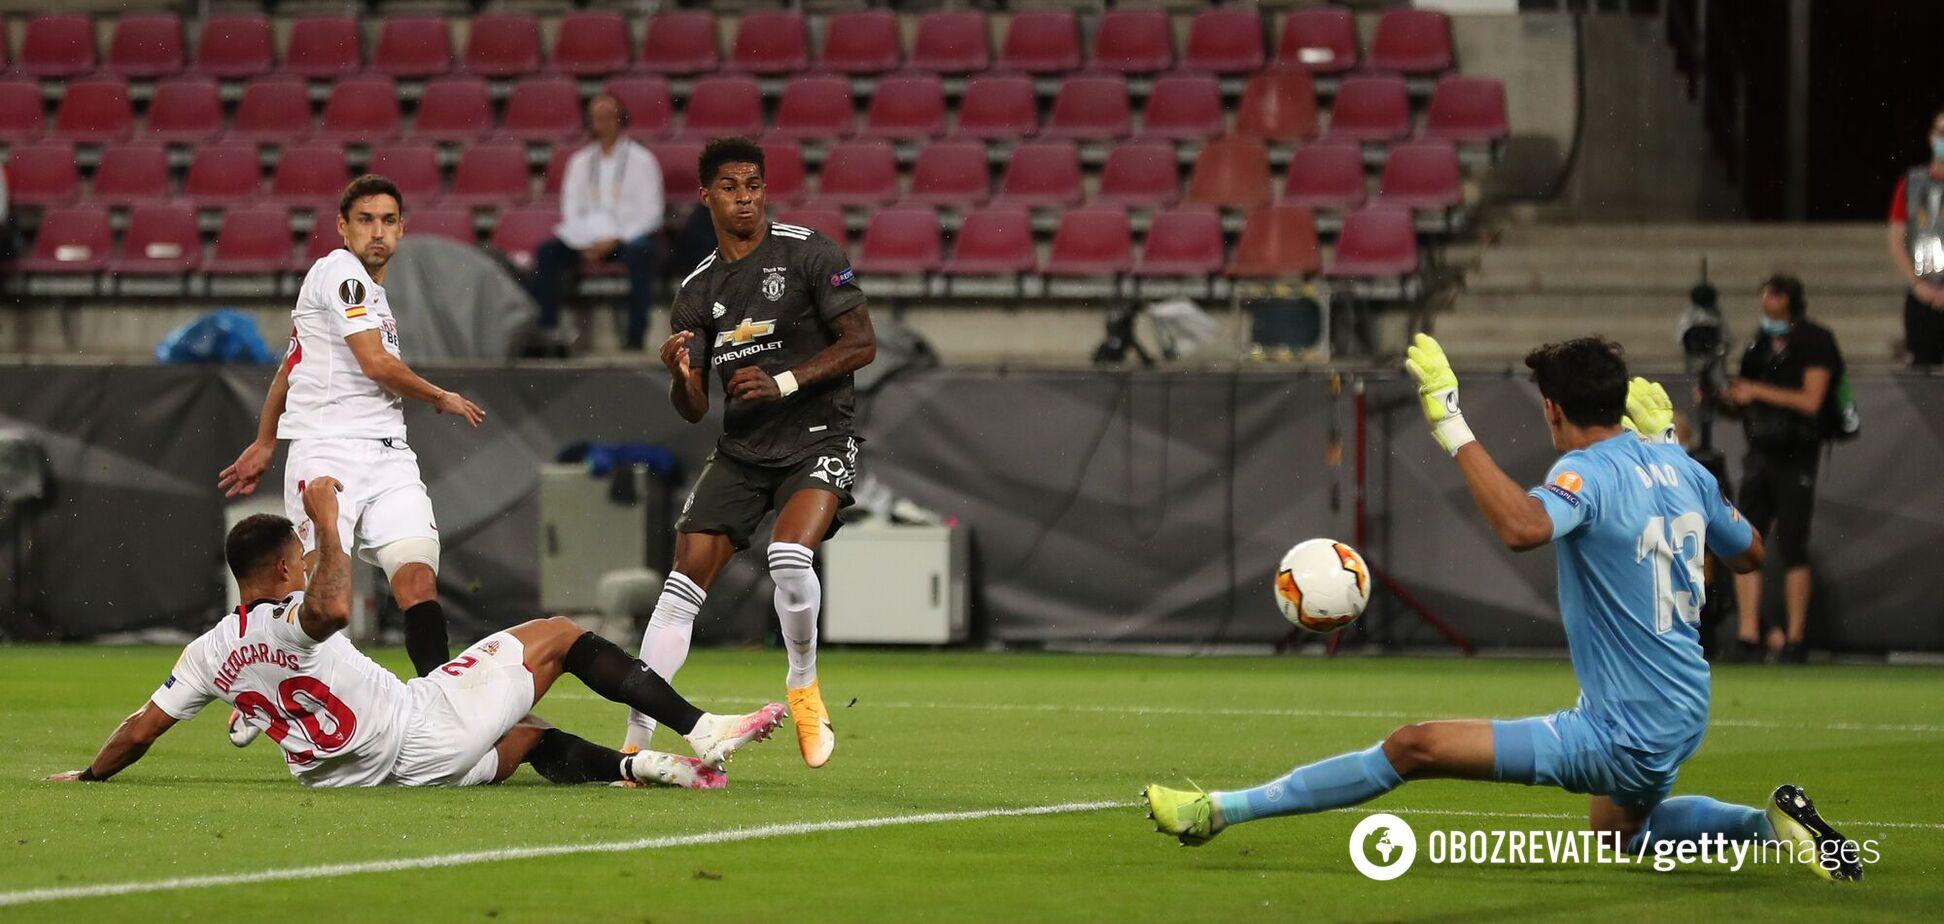 'Севілья' - 'Манчестер Юнайтед'